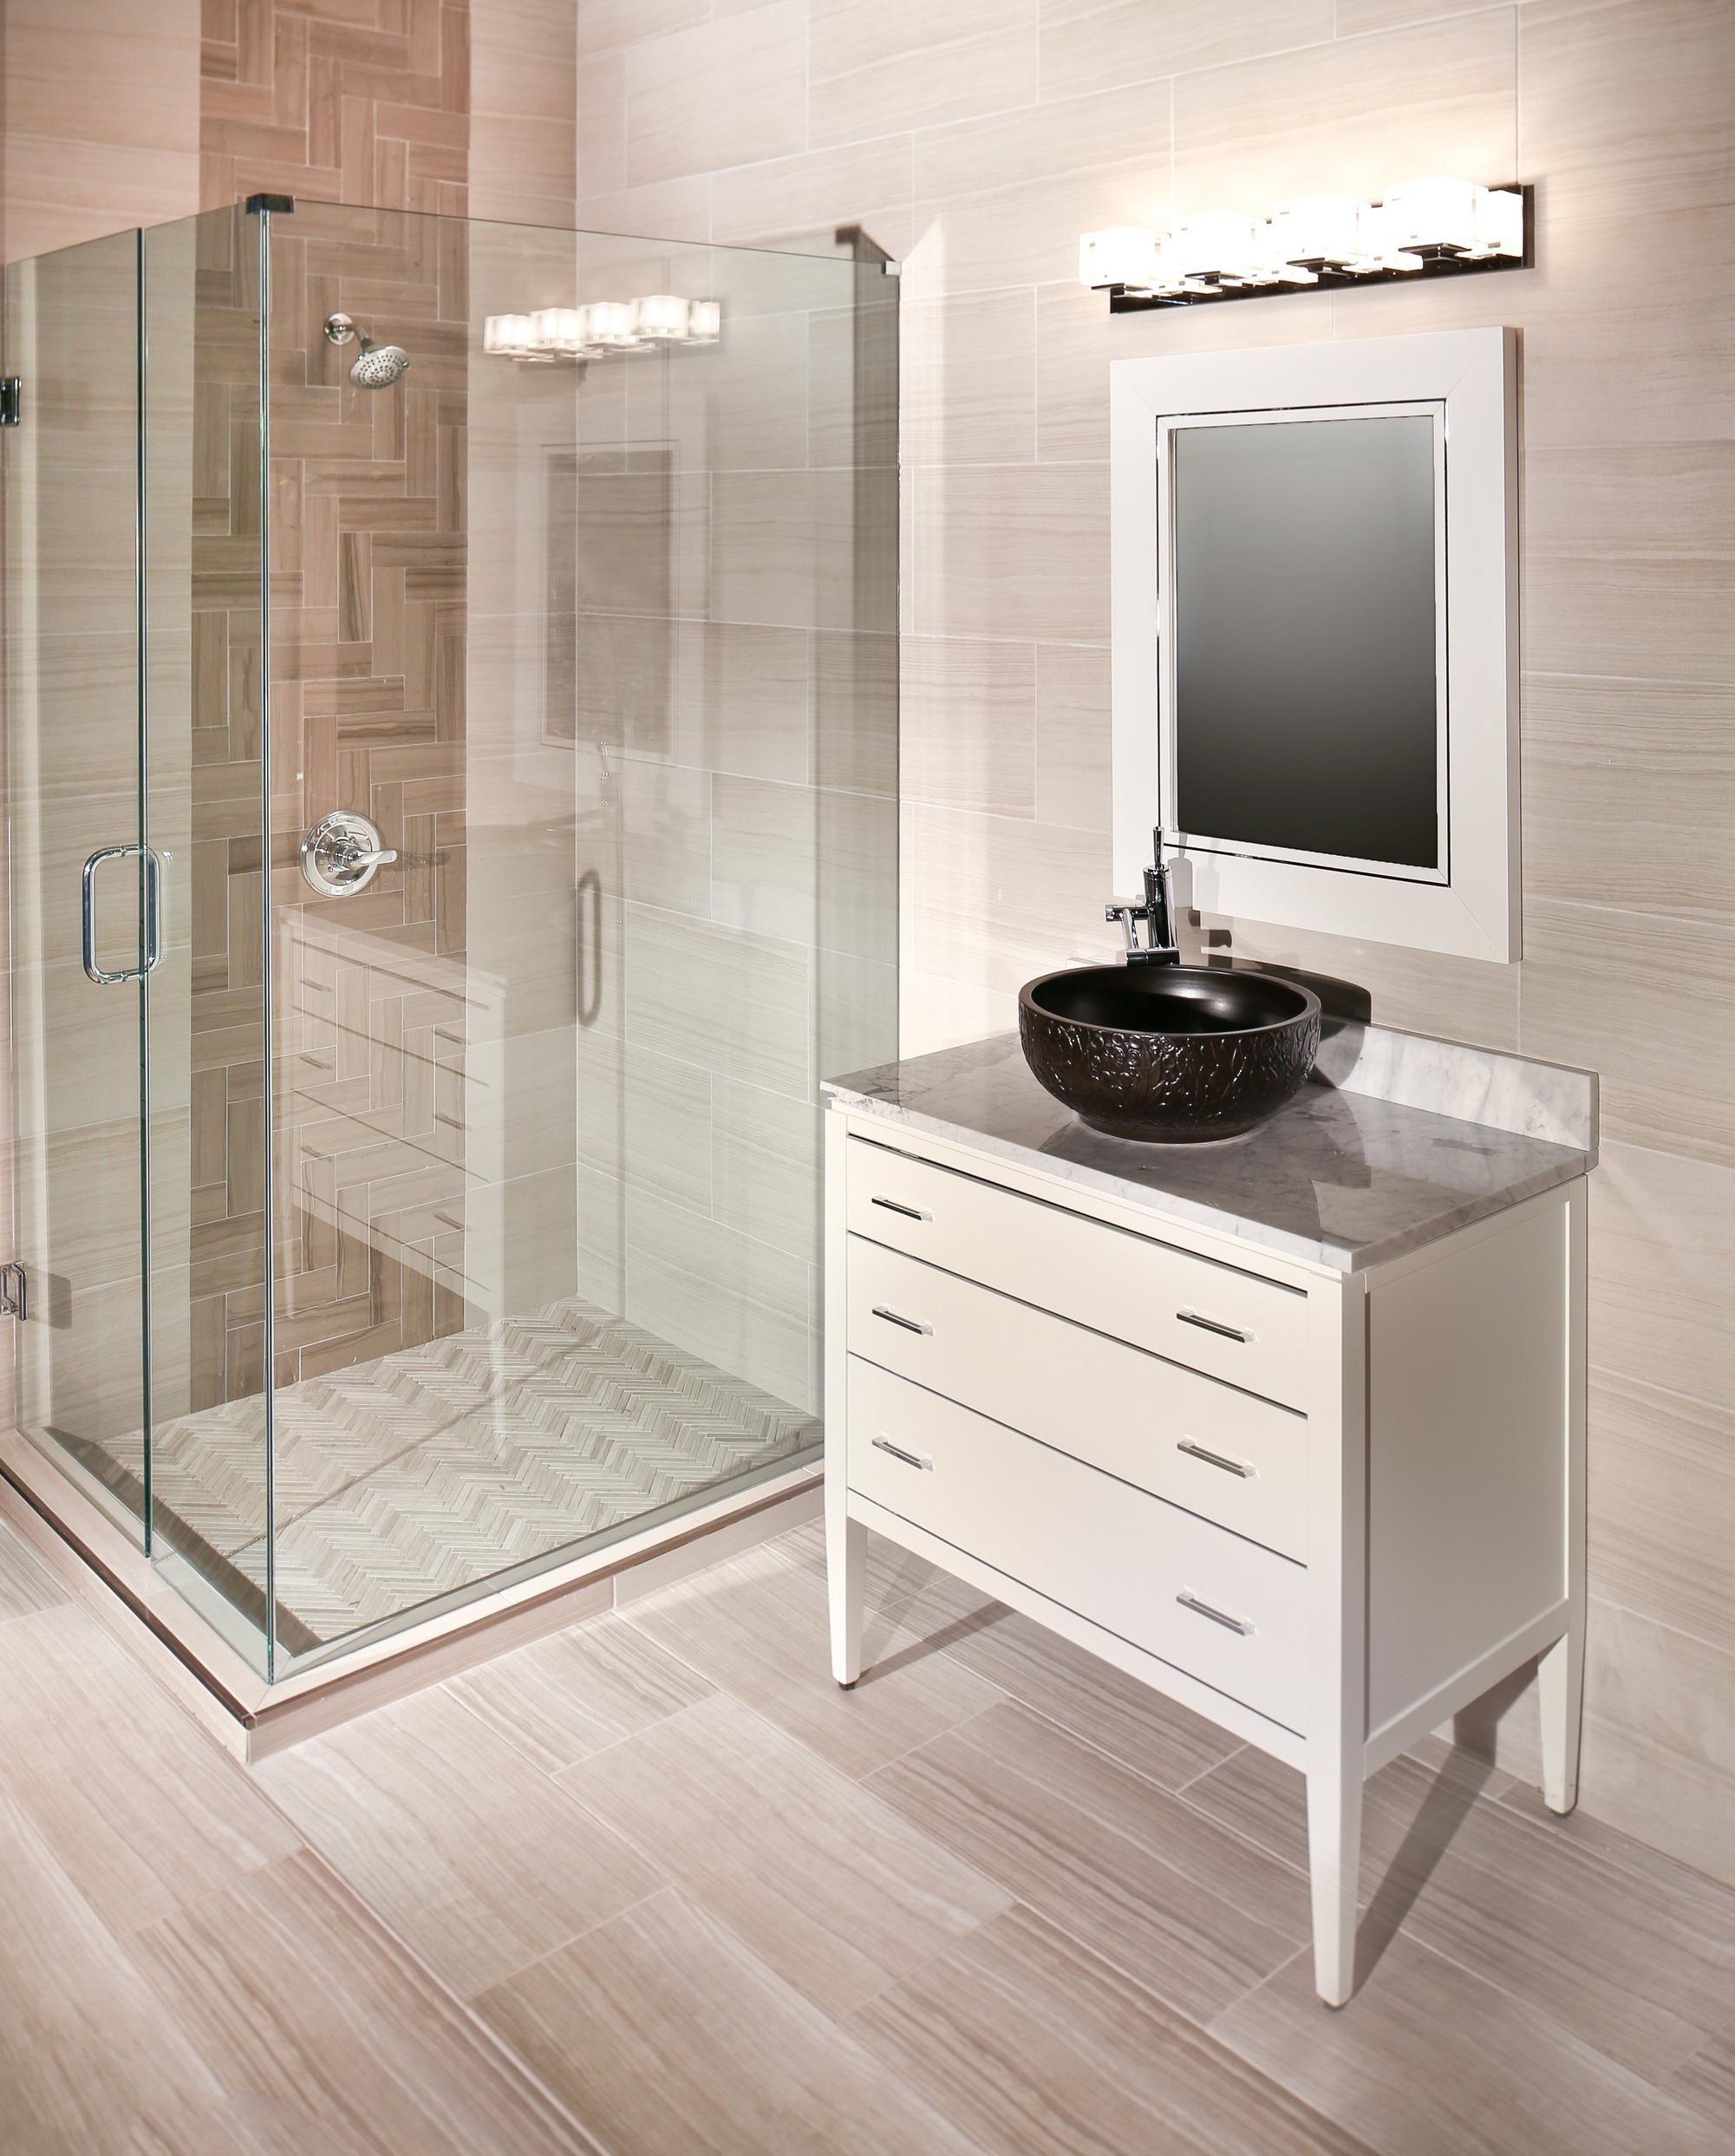 Eramosa White Porcelain Tile 12in X 24in 912102742 Floor